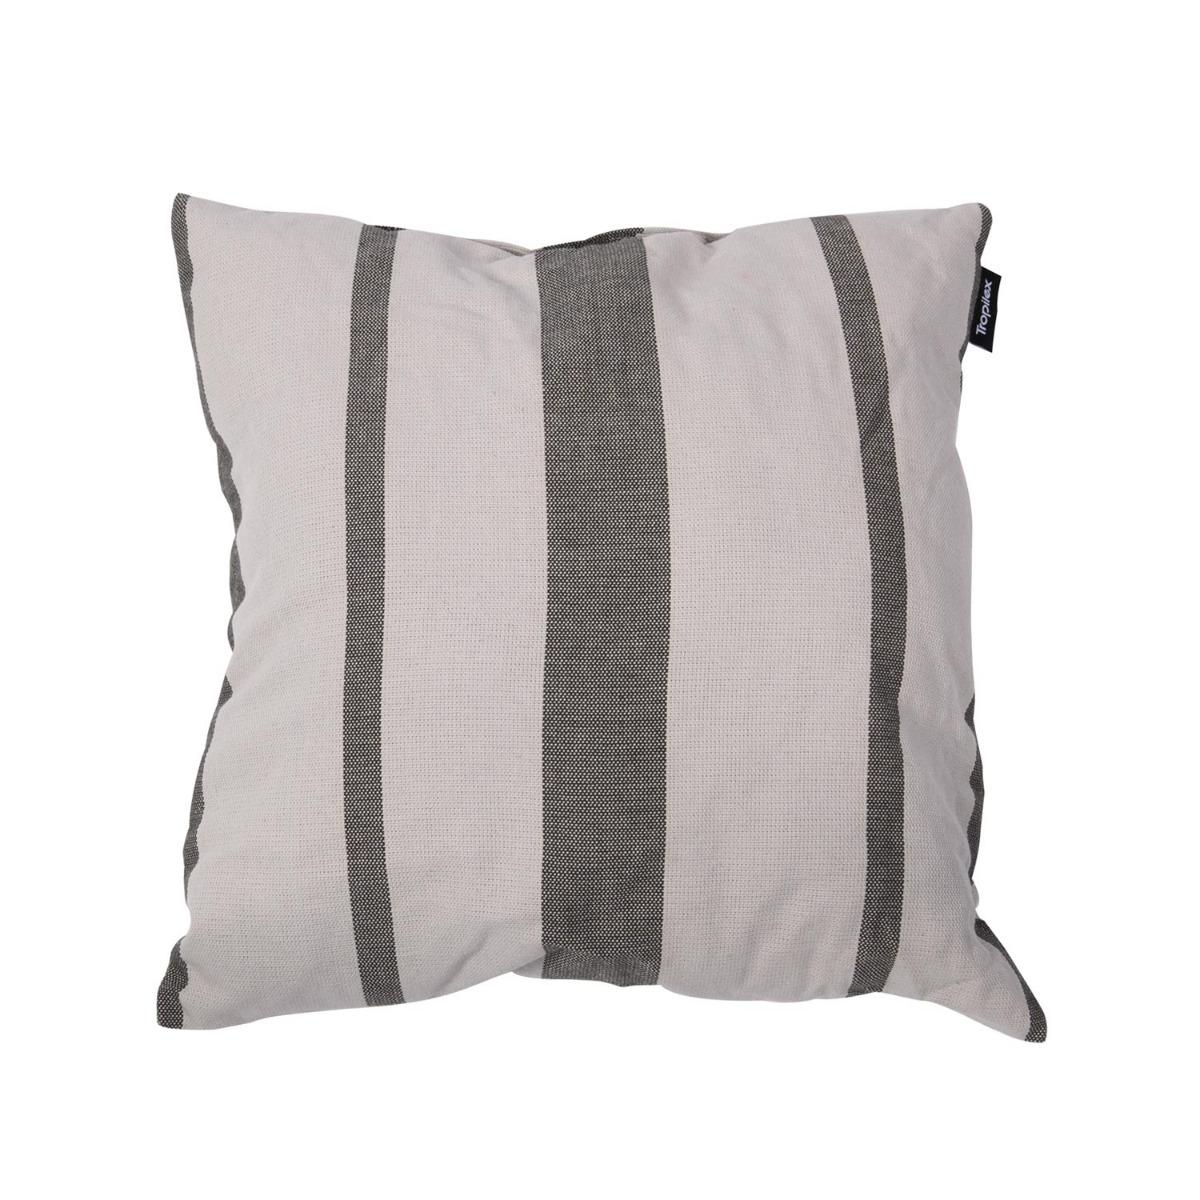 'Stripes' Silver Kussentje - Veelkleurig - Tropilex �